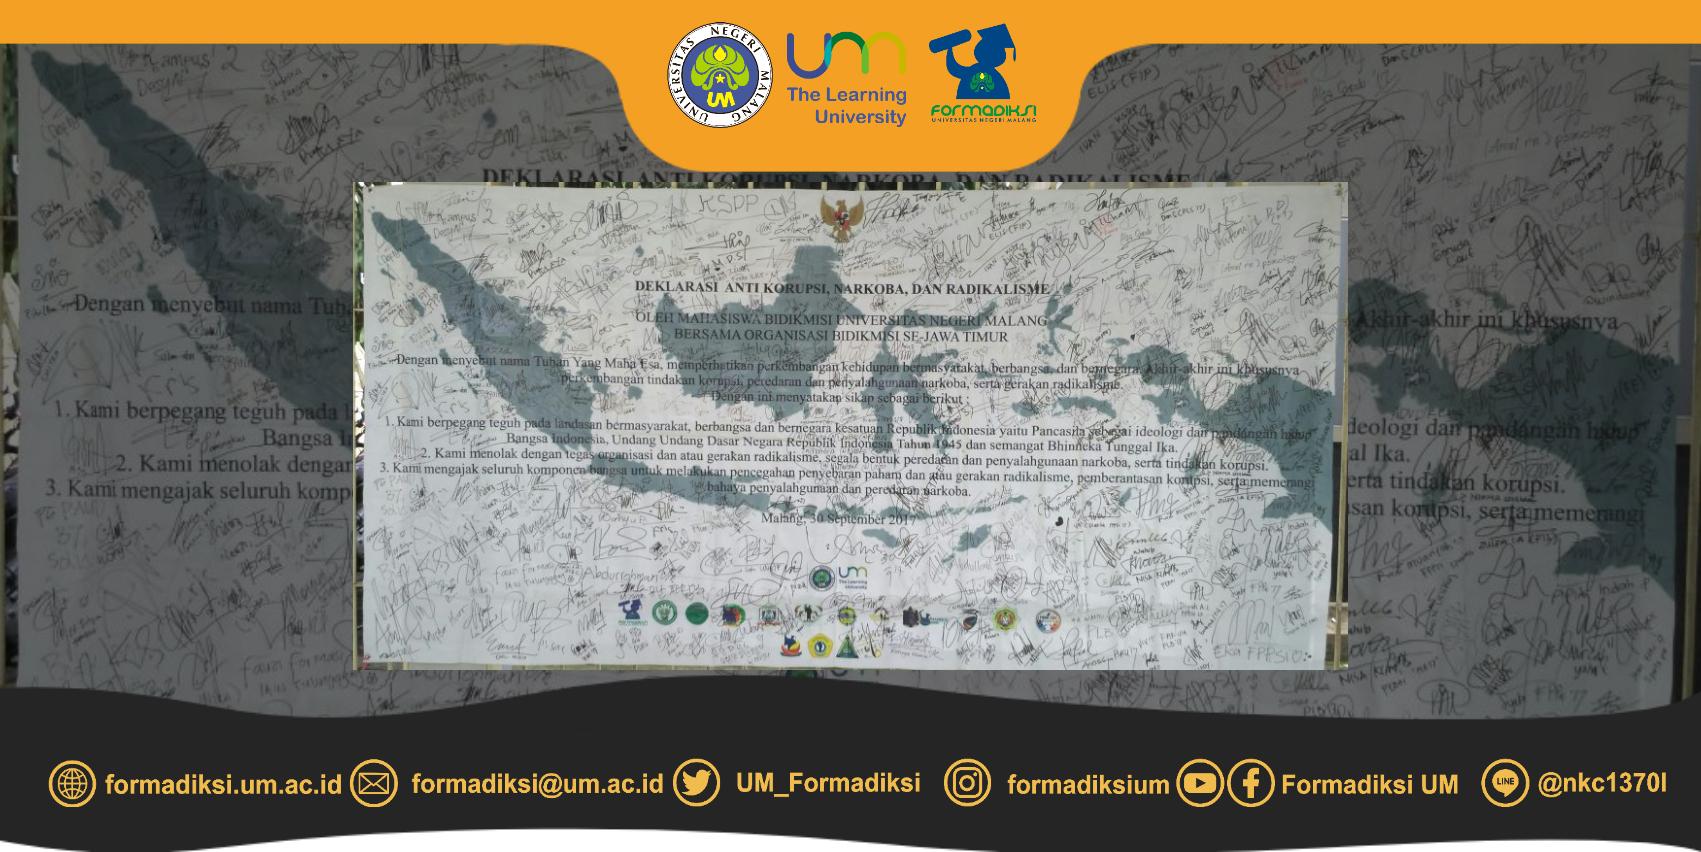 Deklarasi Mahasiswa Baru Bidikmisi UM 2017 bersama Organisasi Bidikmisi Se Jawa Timur